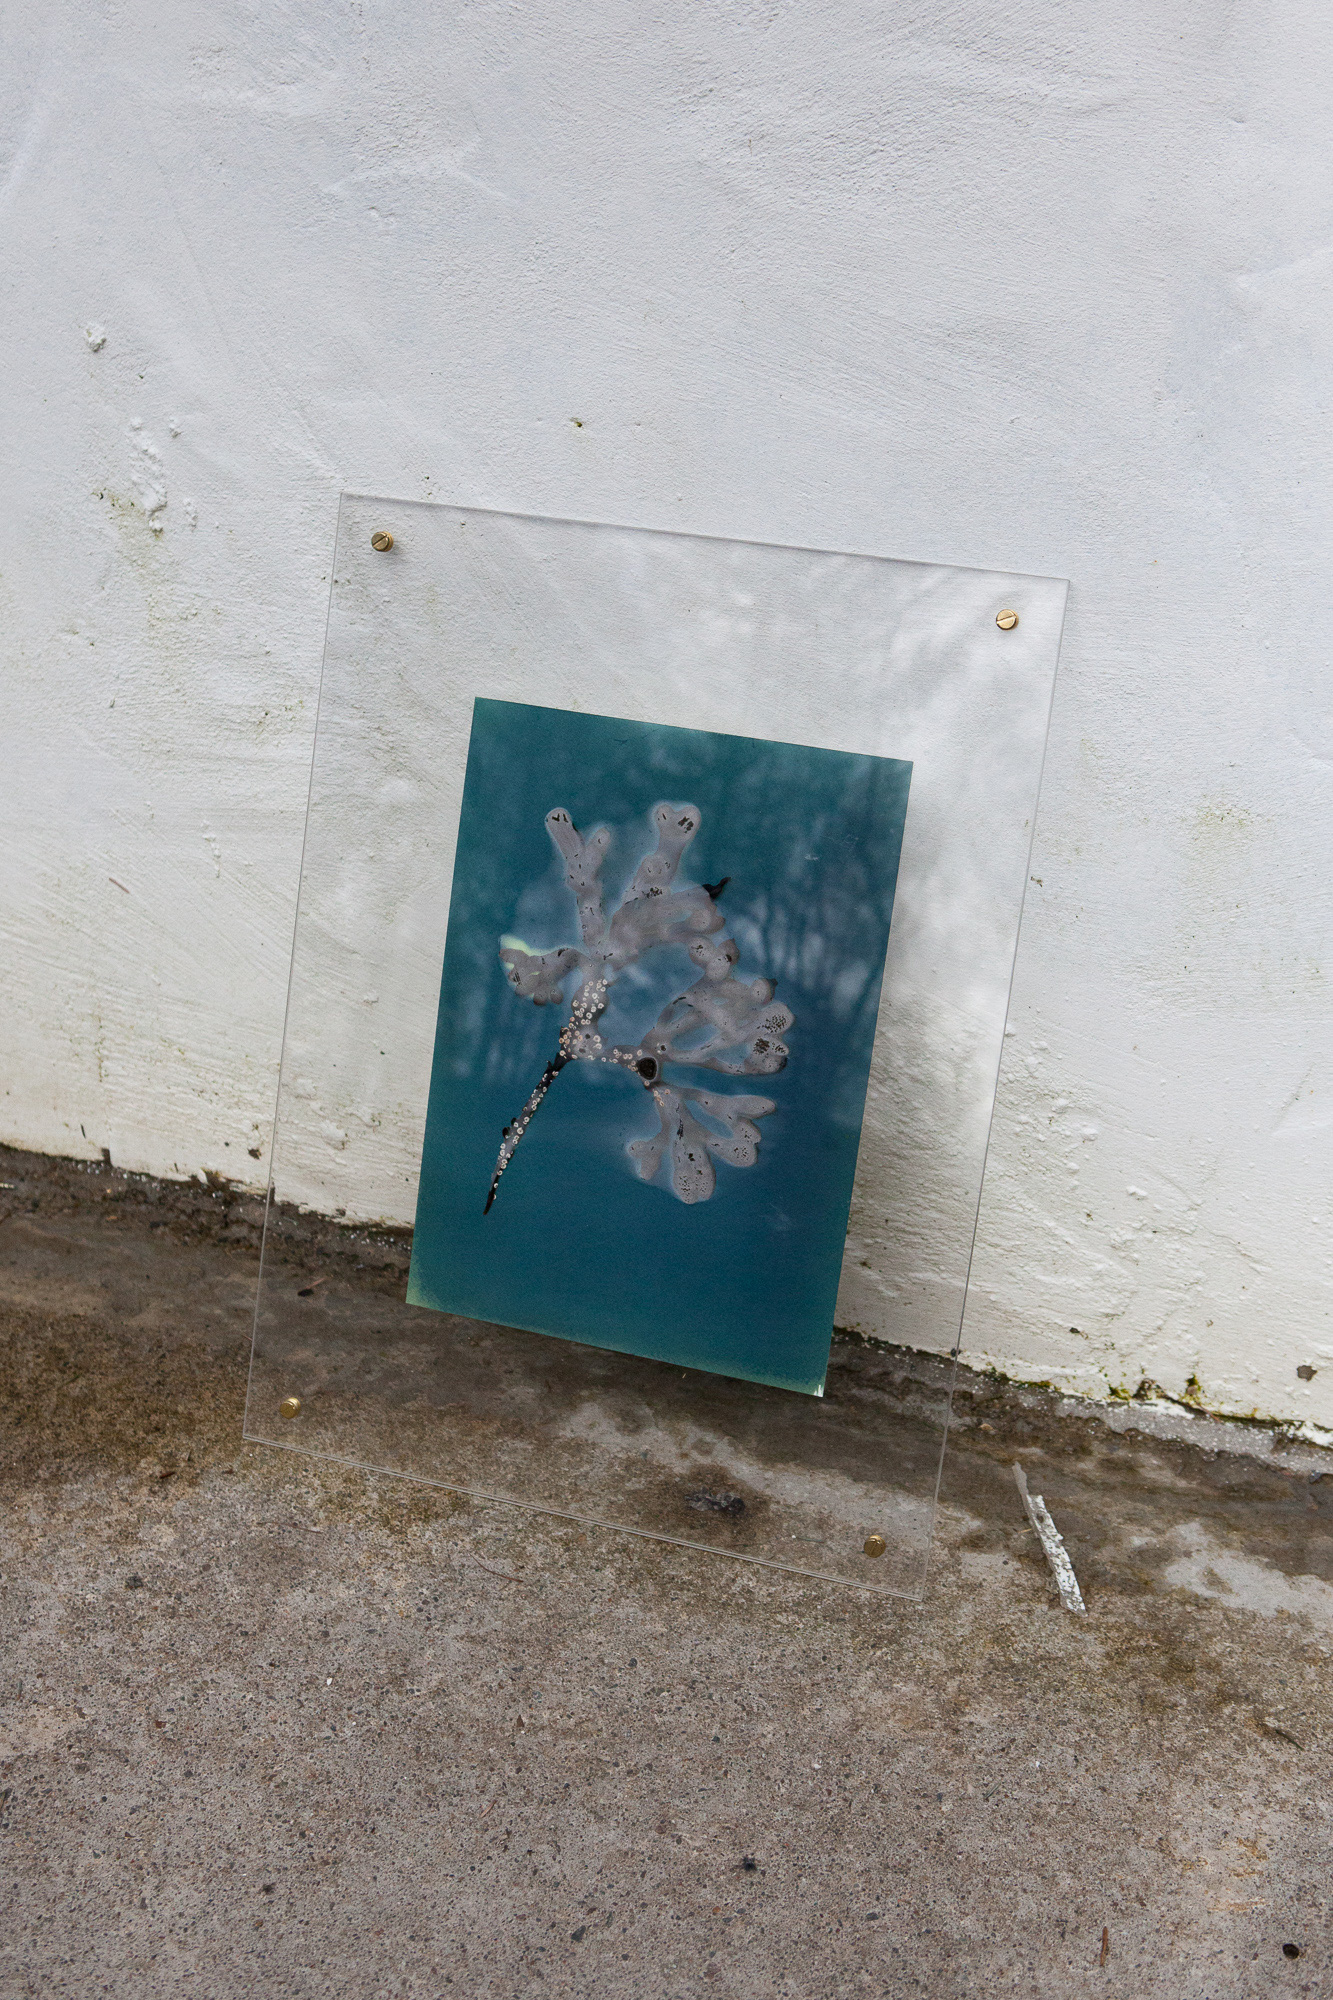 Seaweed on treated paper during exposure.